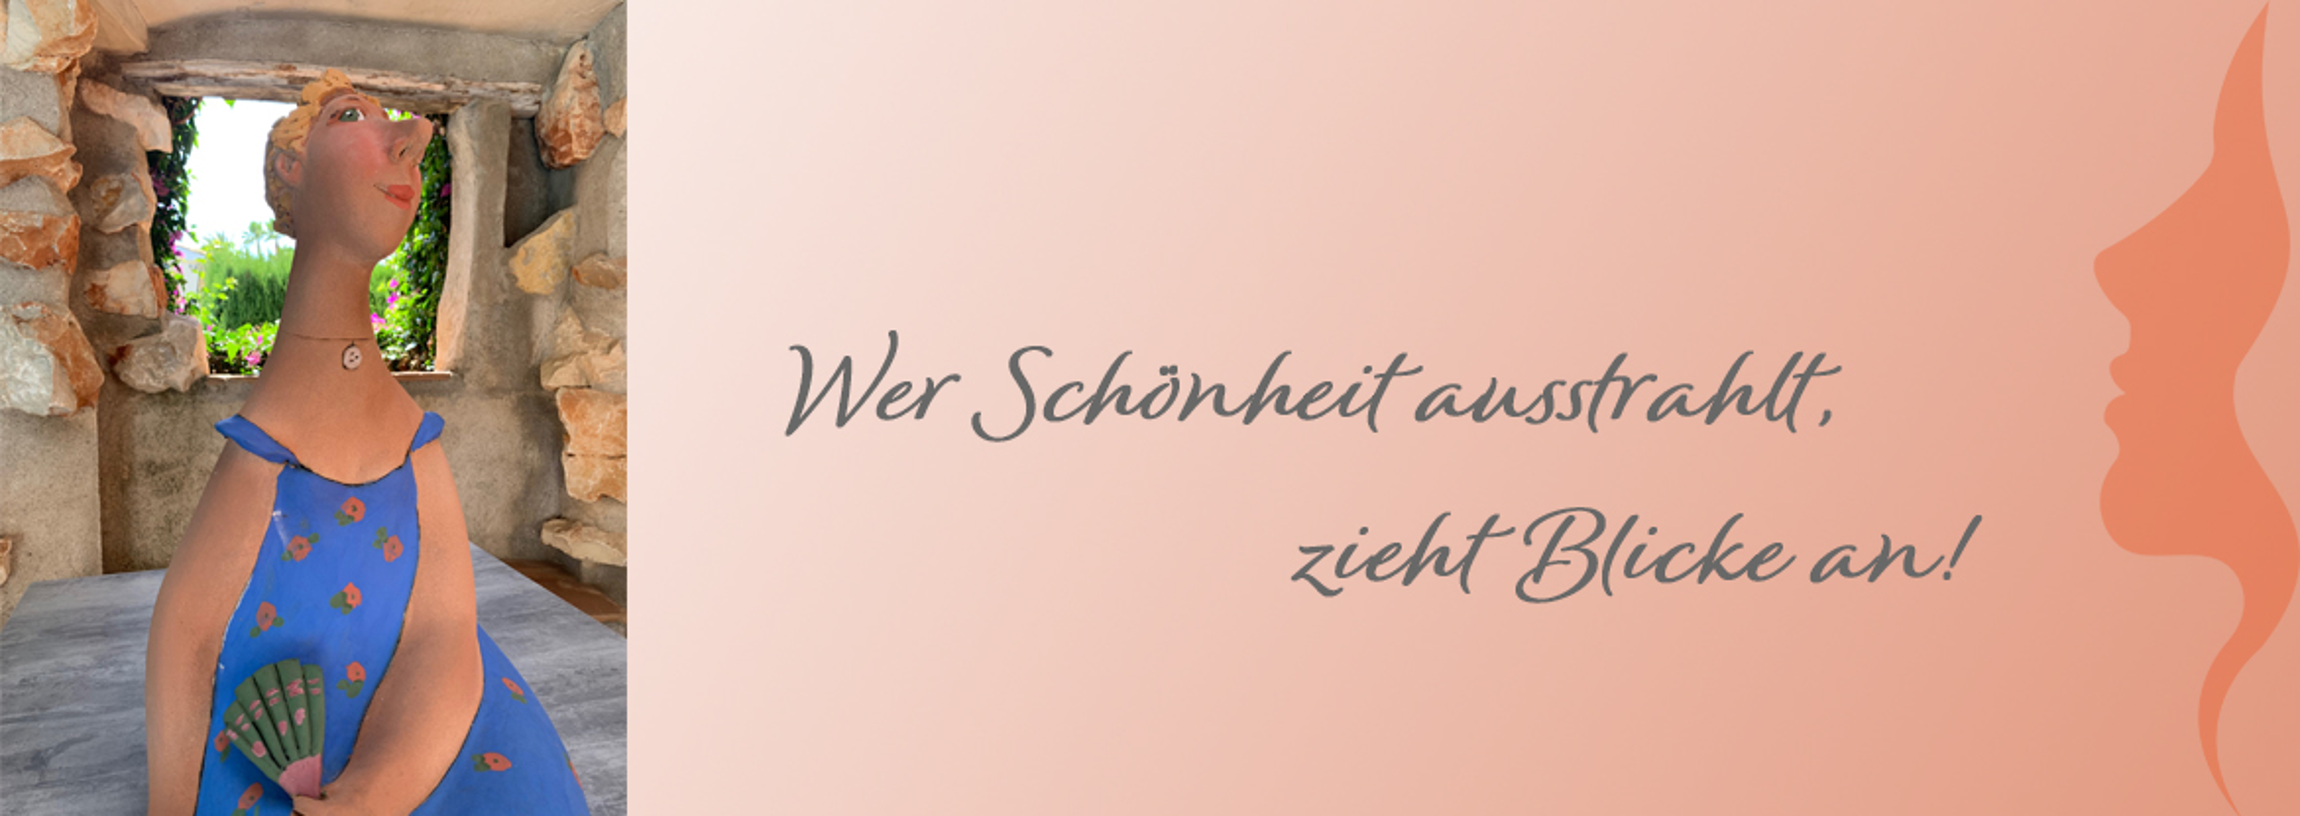 Kosmetik Institut NEW FACE Berlin, Wilmersdorf, Birgitt Zahlmann, Kosmetik-Institut Berlin, Beauty Berlin, Schönheitstermin, Beauty-Tag, Wilmersdorf, Kosmetik Berlin, Beauty-Termin Berlin